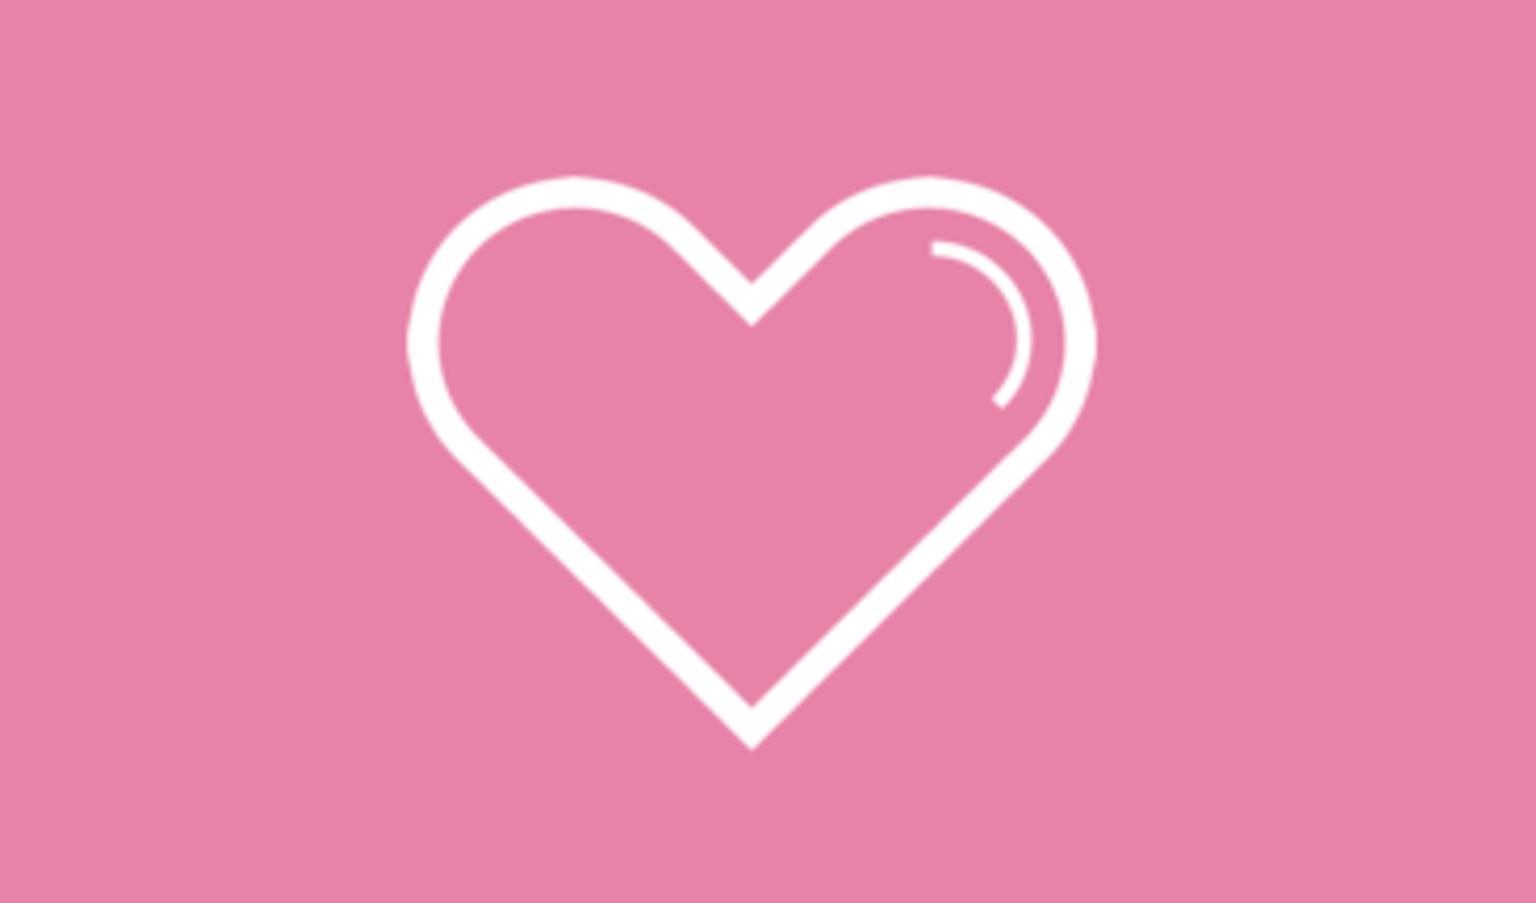 Bröstcancer – Rosa Bandet   Cancerfonden